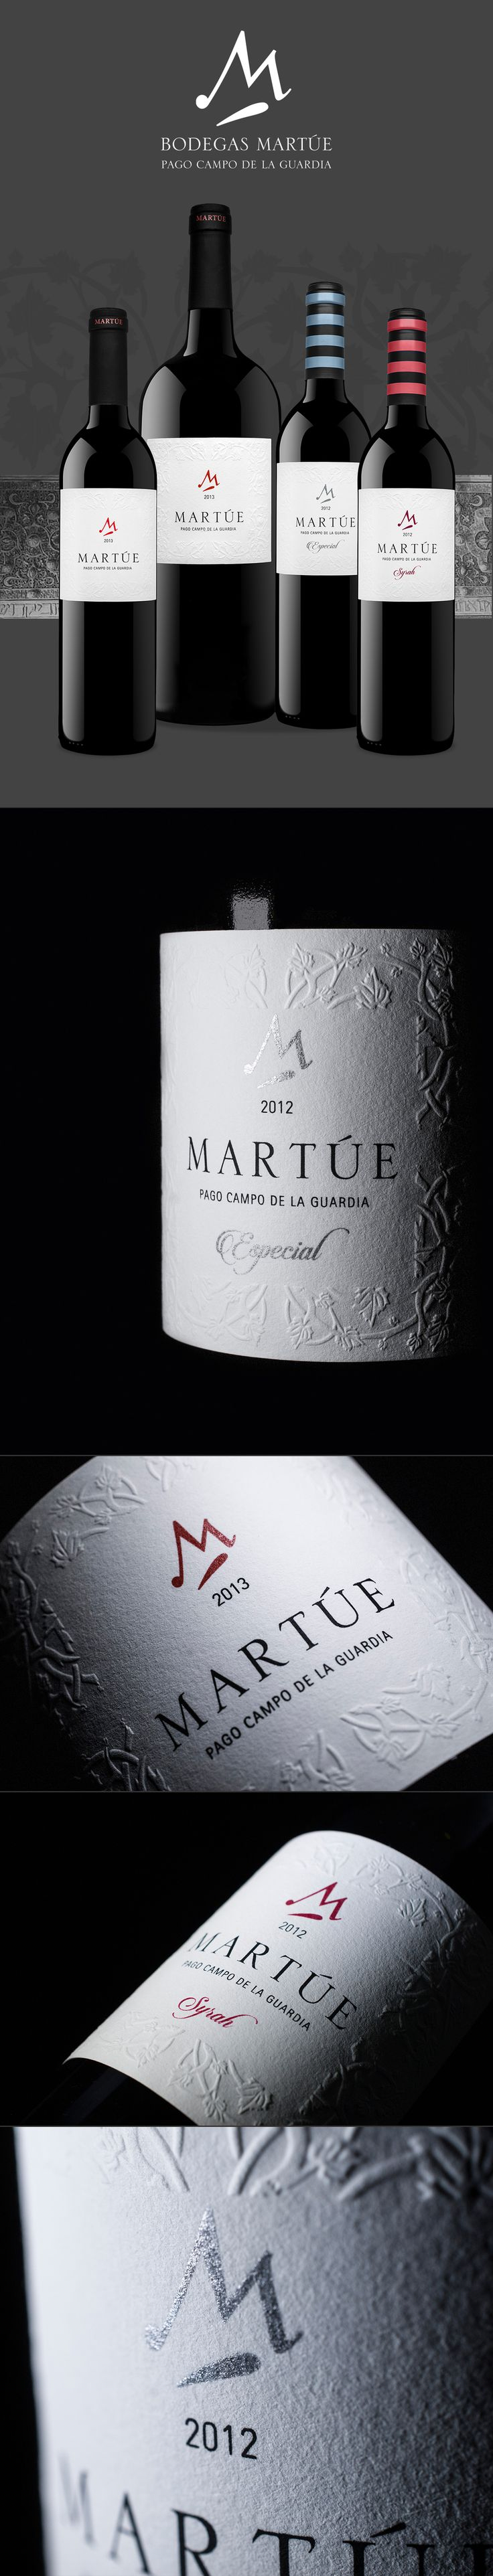 BODEGAS MARTÚE Pago Campo de la Guardia - Wine branding design - SPAINCREATIVE